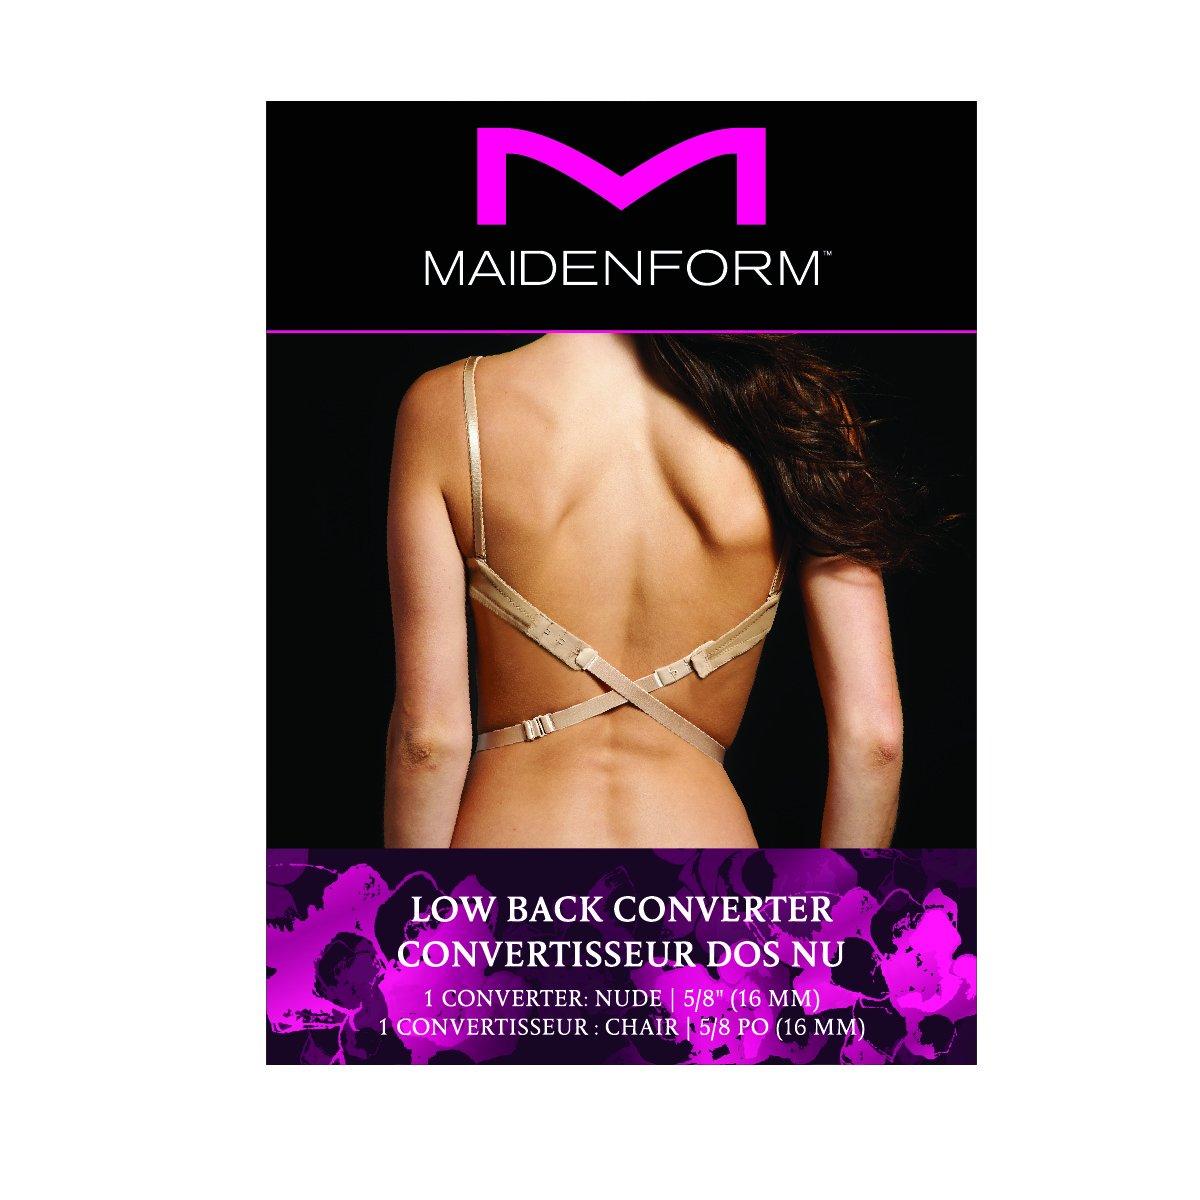 b23f0cbe421 Maidenform Women's Low Back Bra Converter, Black, One Size at Amazon Women's  Clothing store: